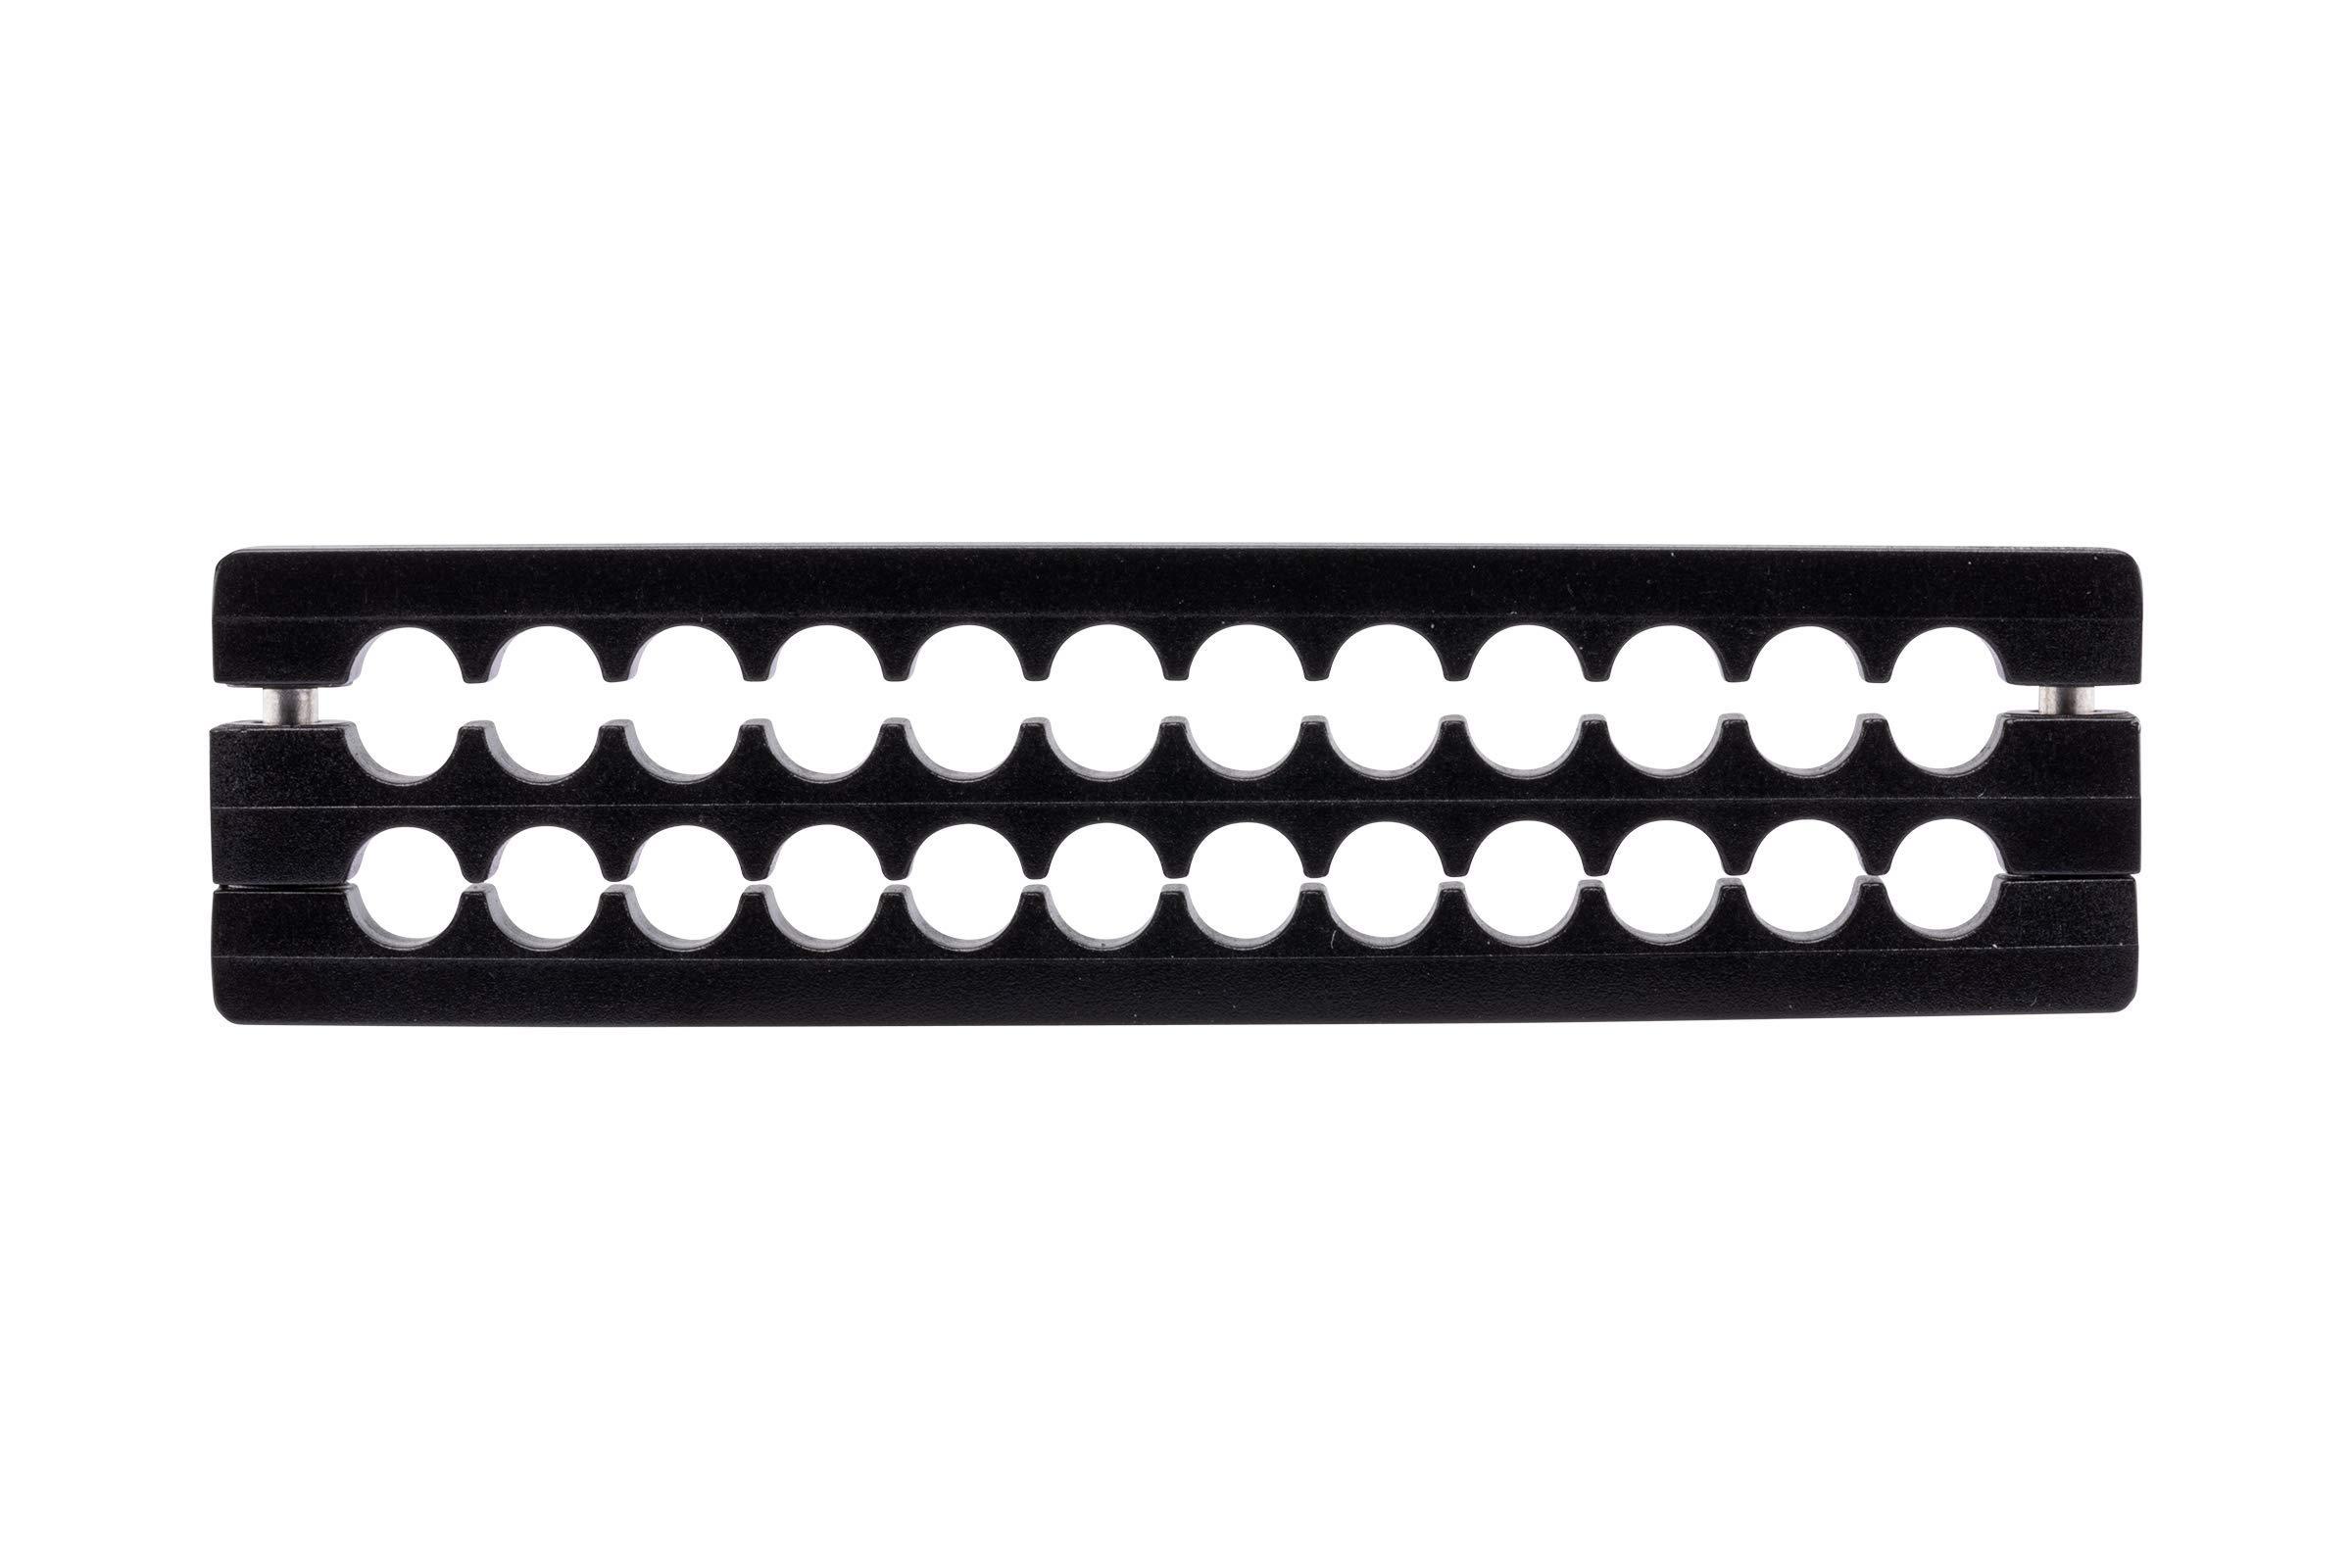 CORSAIR Premium Individually Sleeved PSU Cables Starter Kit - Black, 2 Yr Warranty, for Corsair PSUs by Corsair (Image #9)